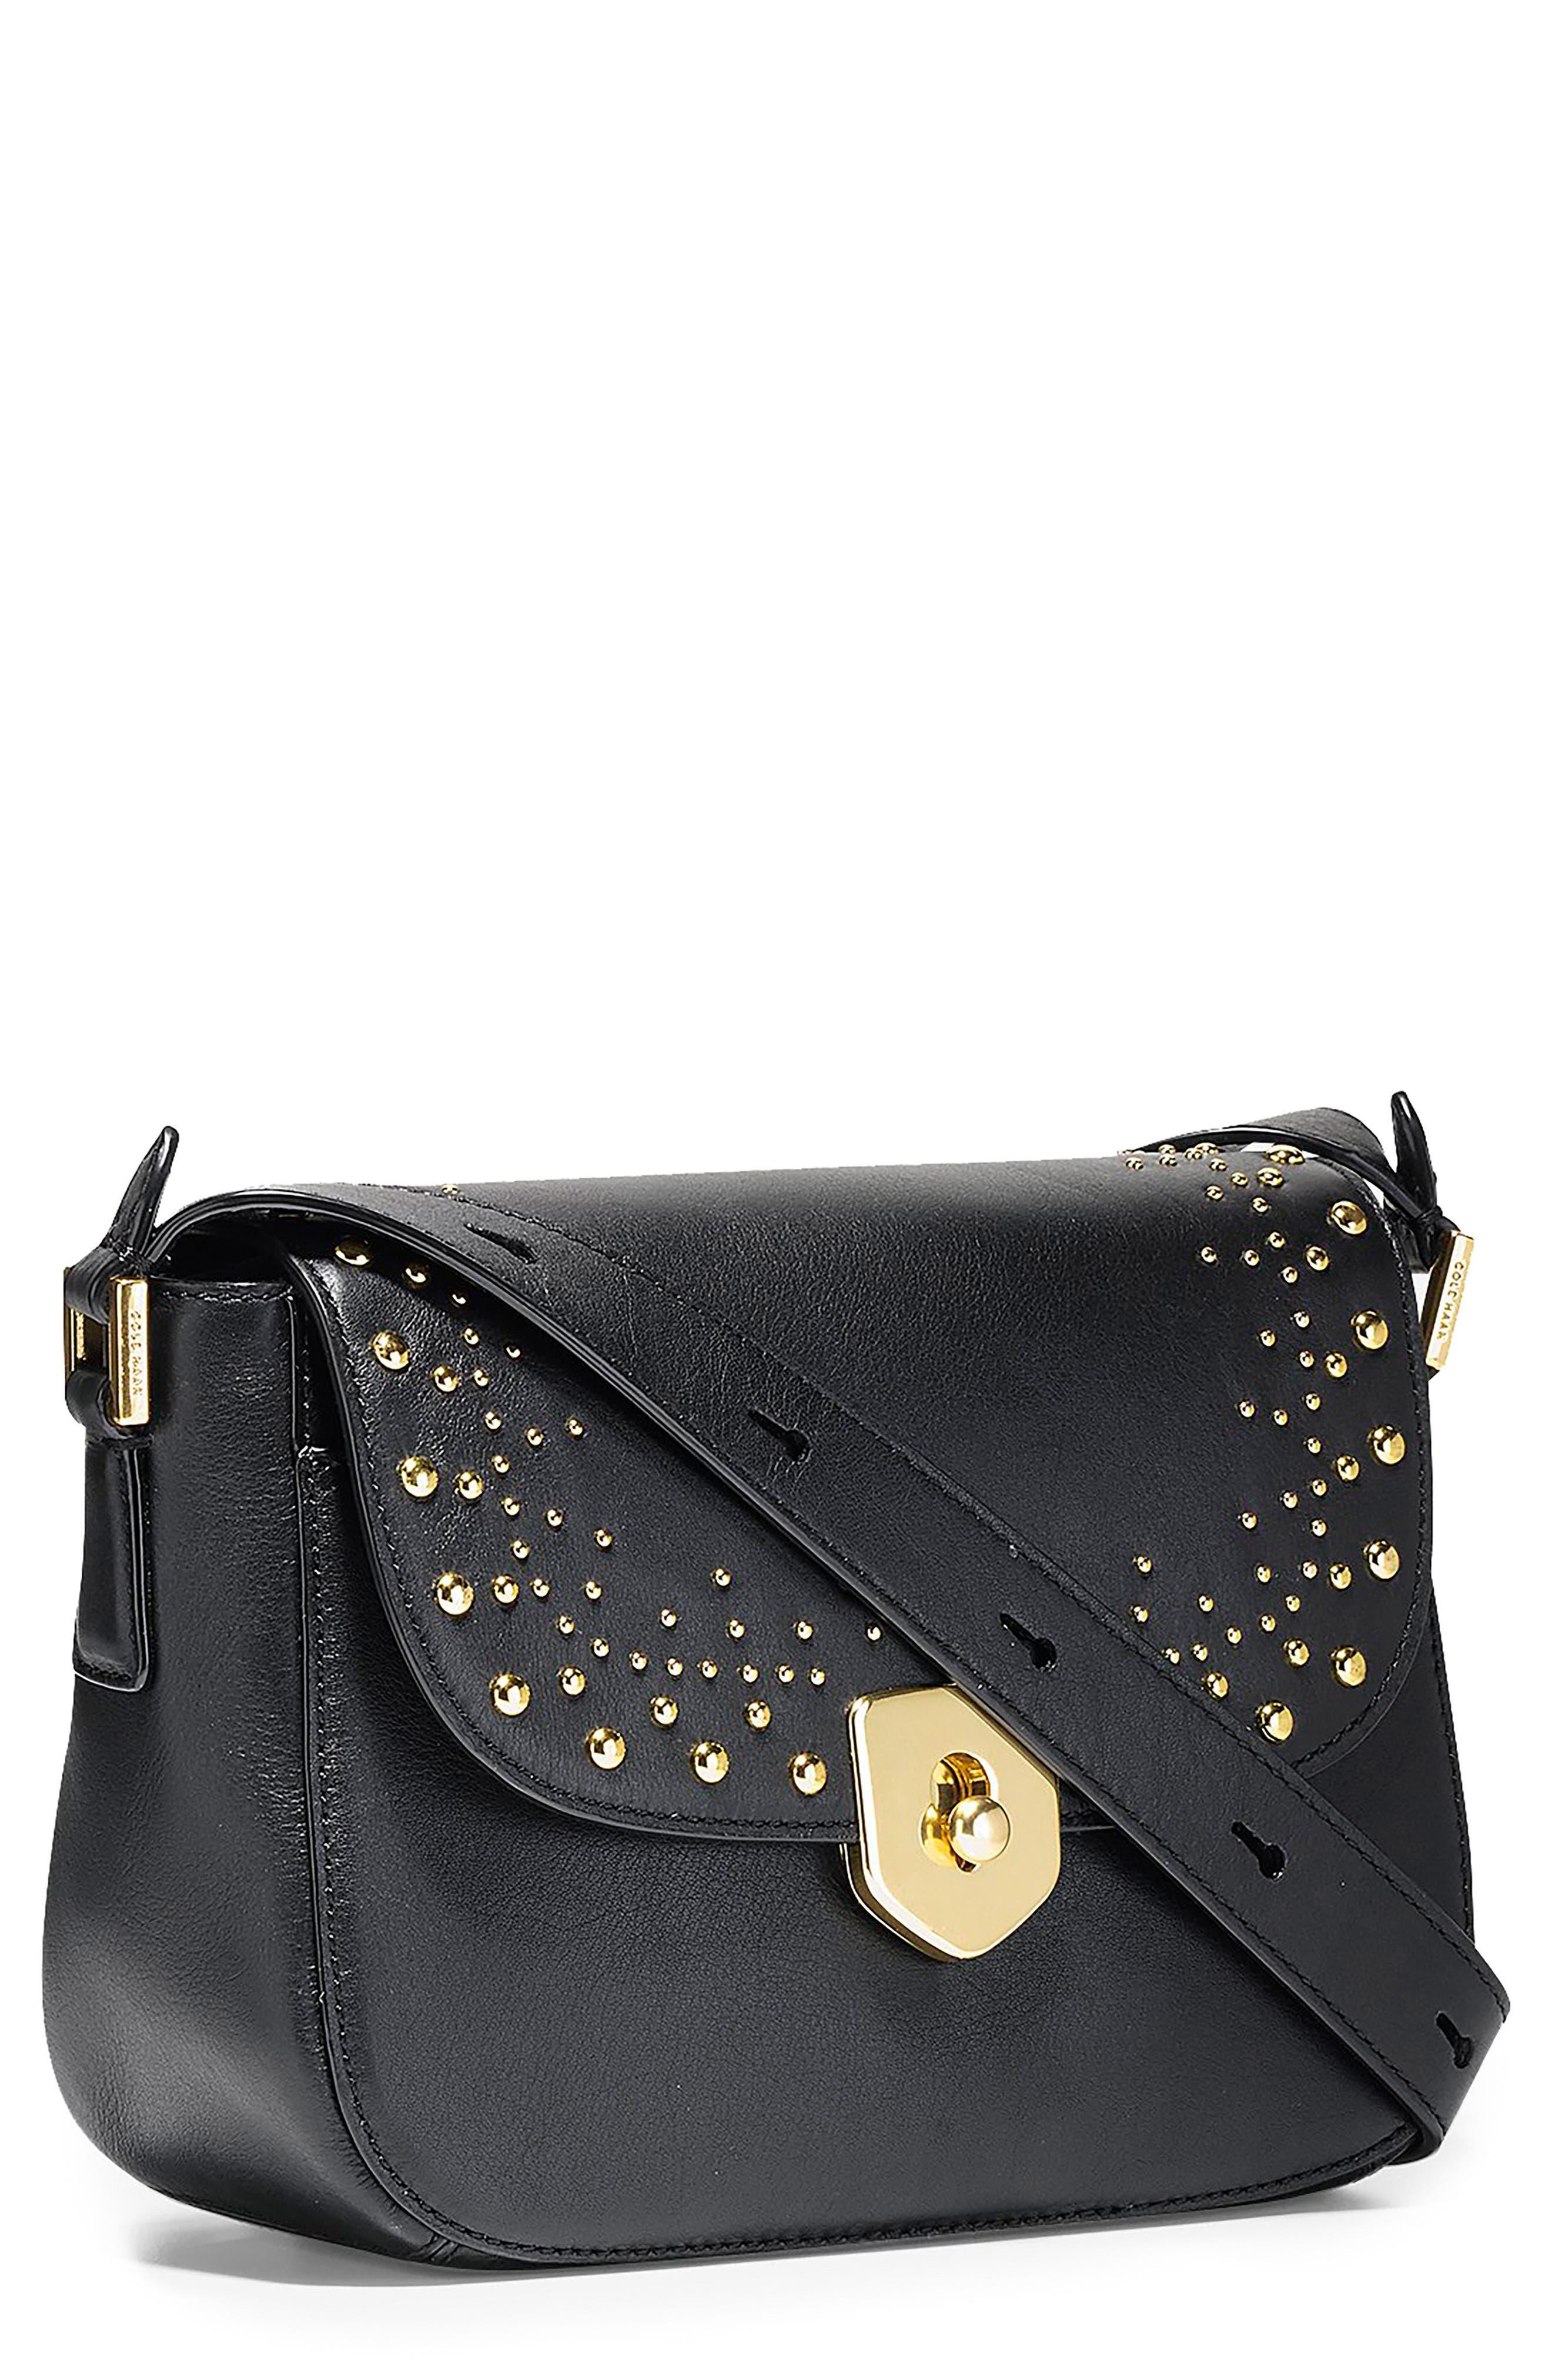 Mini Marli Studded Leather Saddle Bag,                         Main,                         color, Black